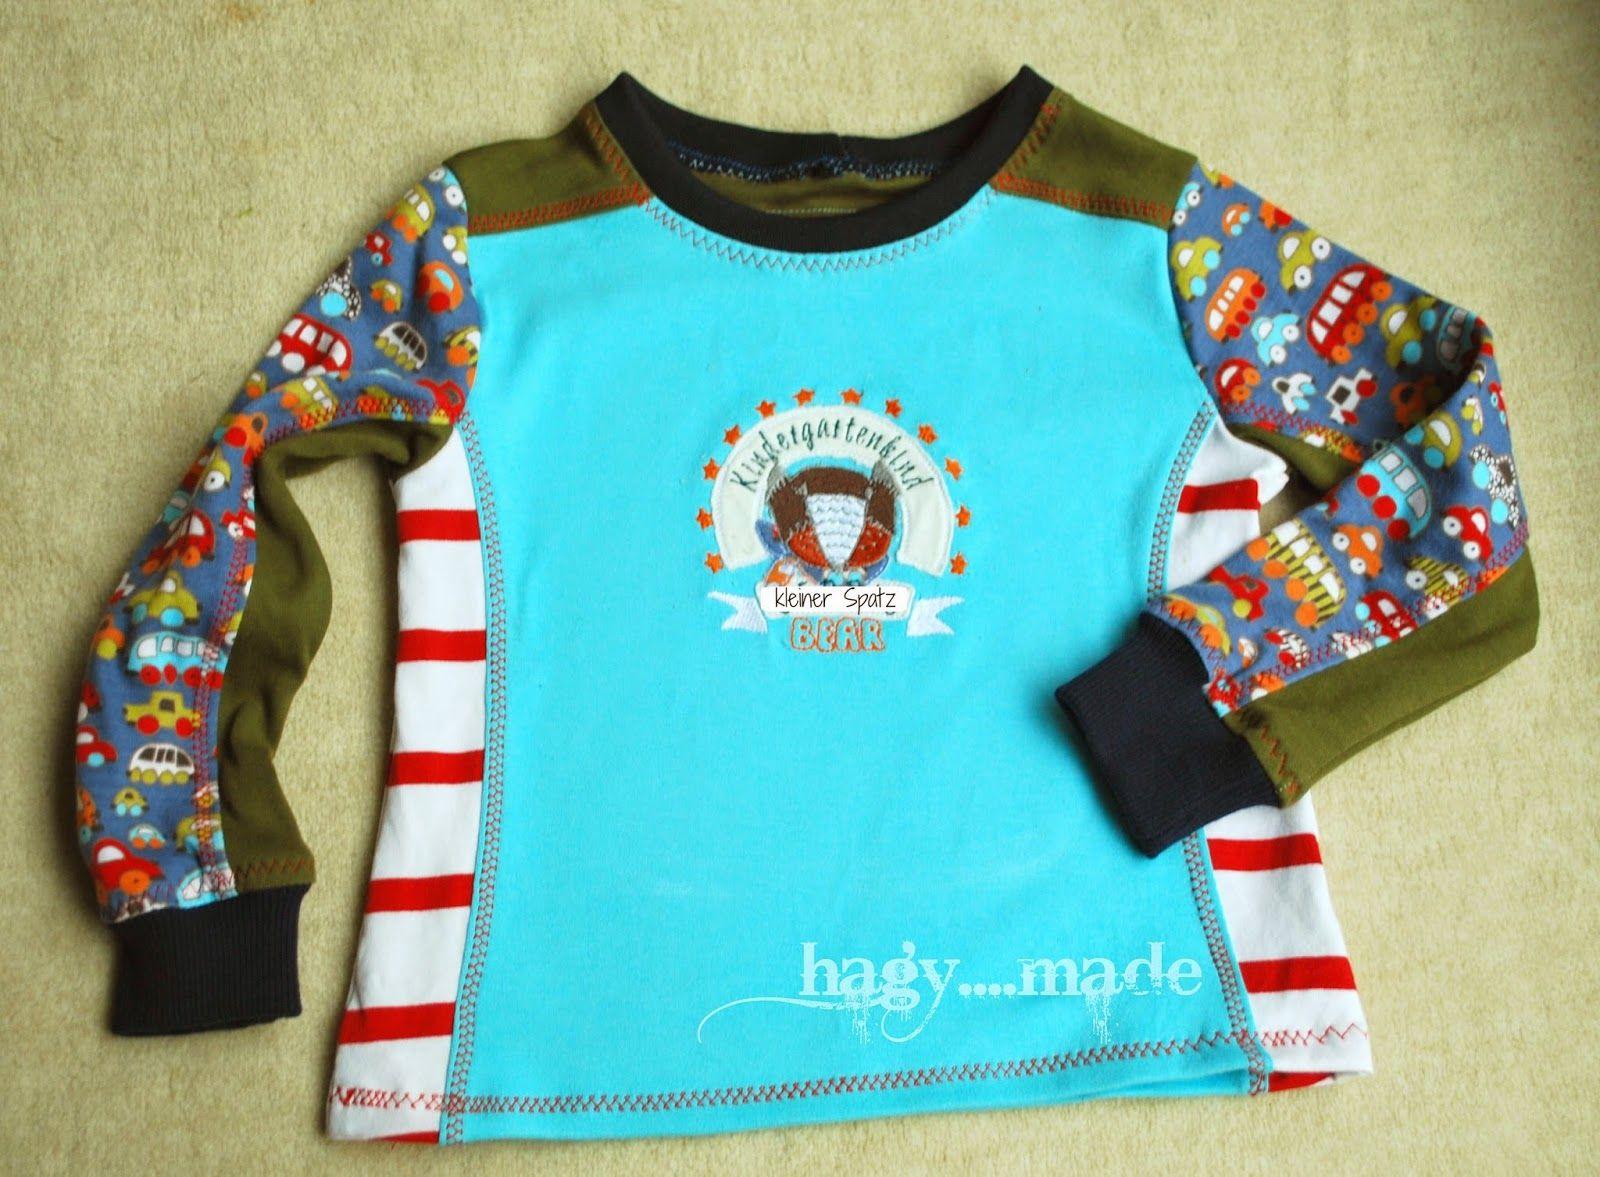 hagy...made: Shirtwoche Tag 7